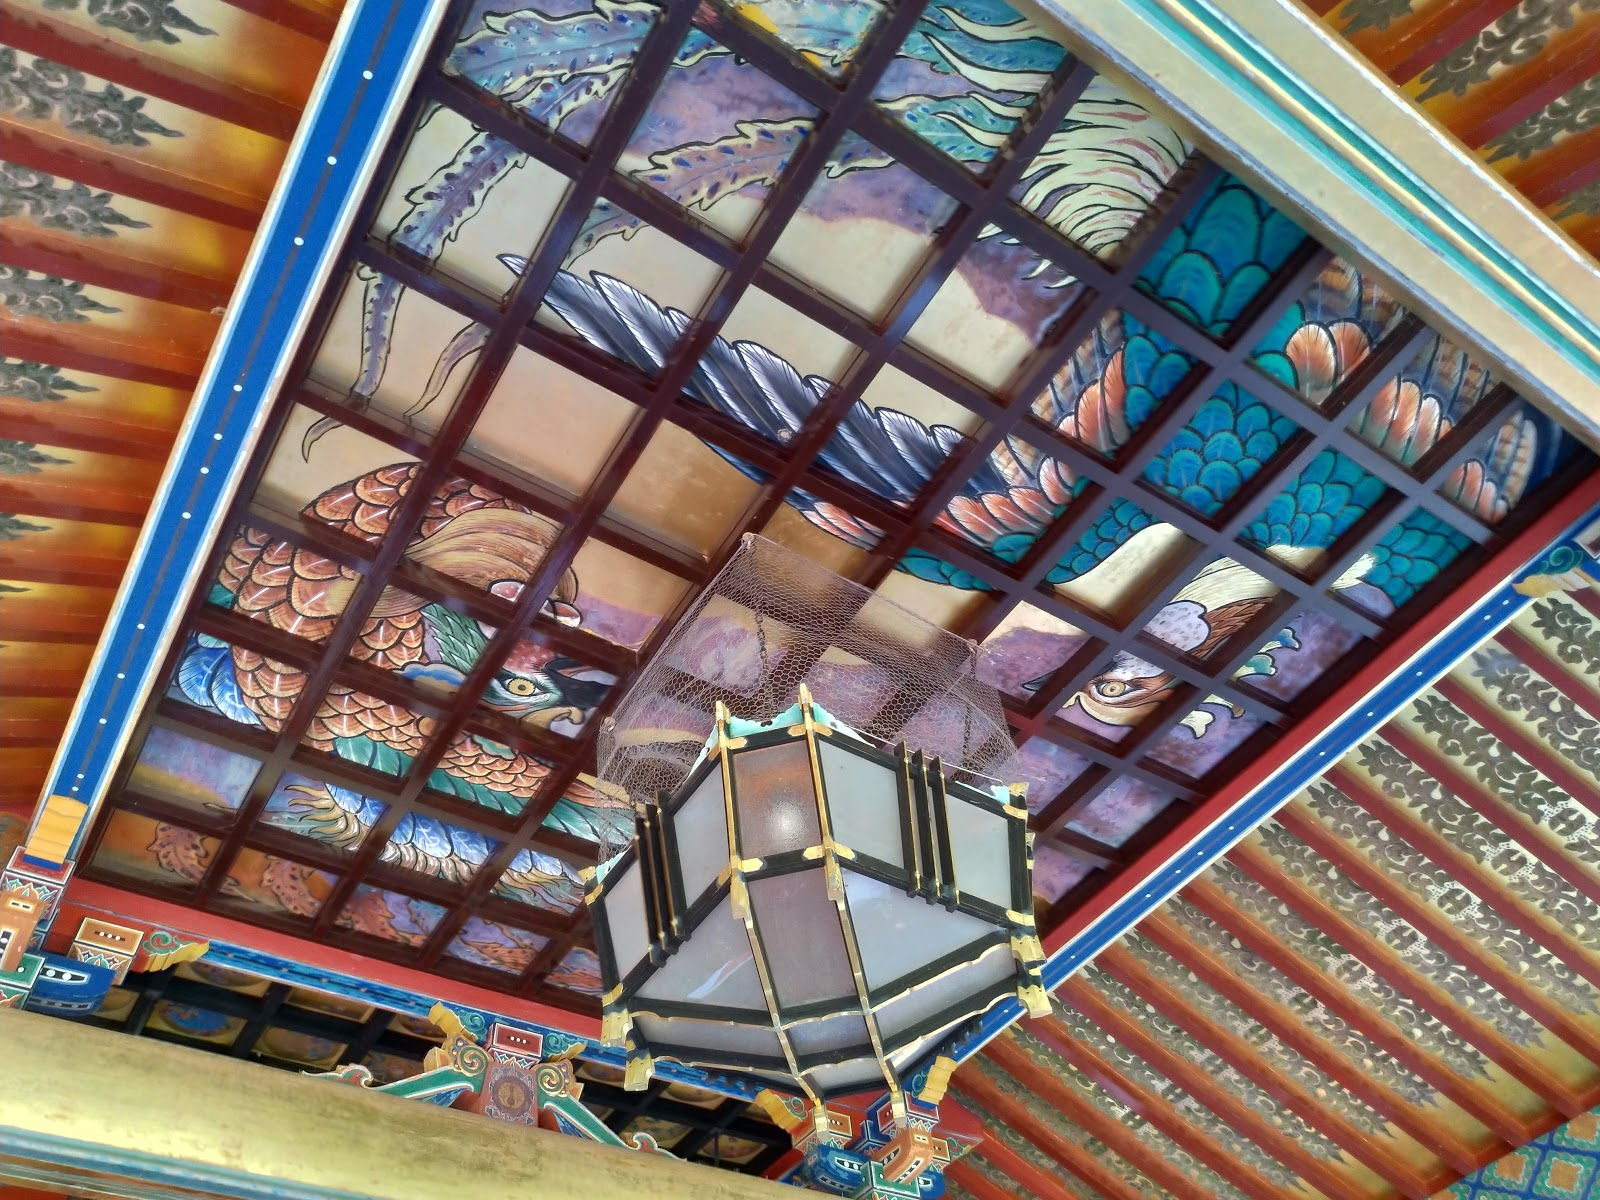 佐賀・祐徳稲荷神社の天井